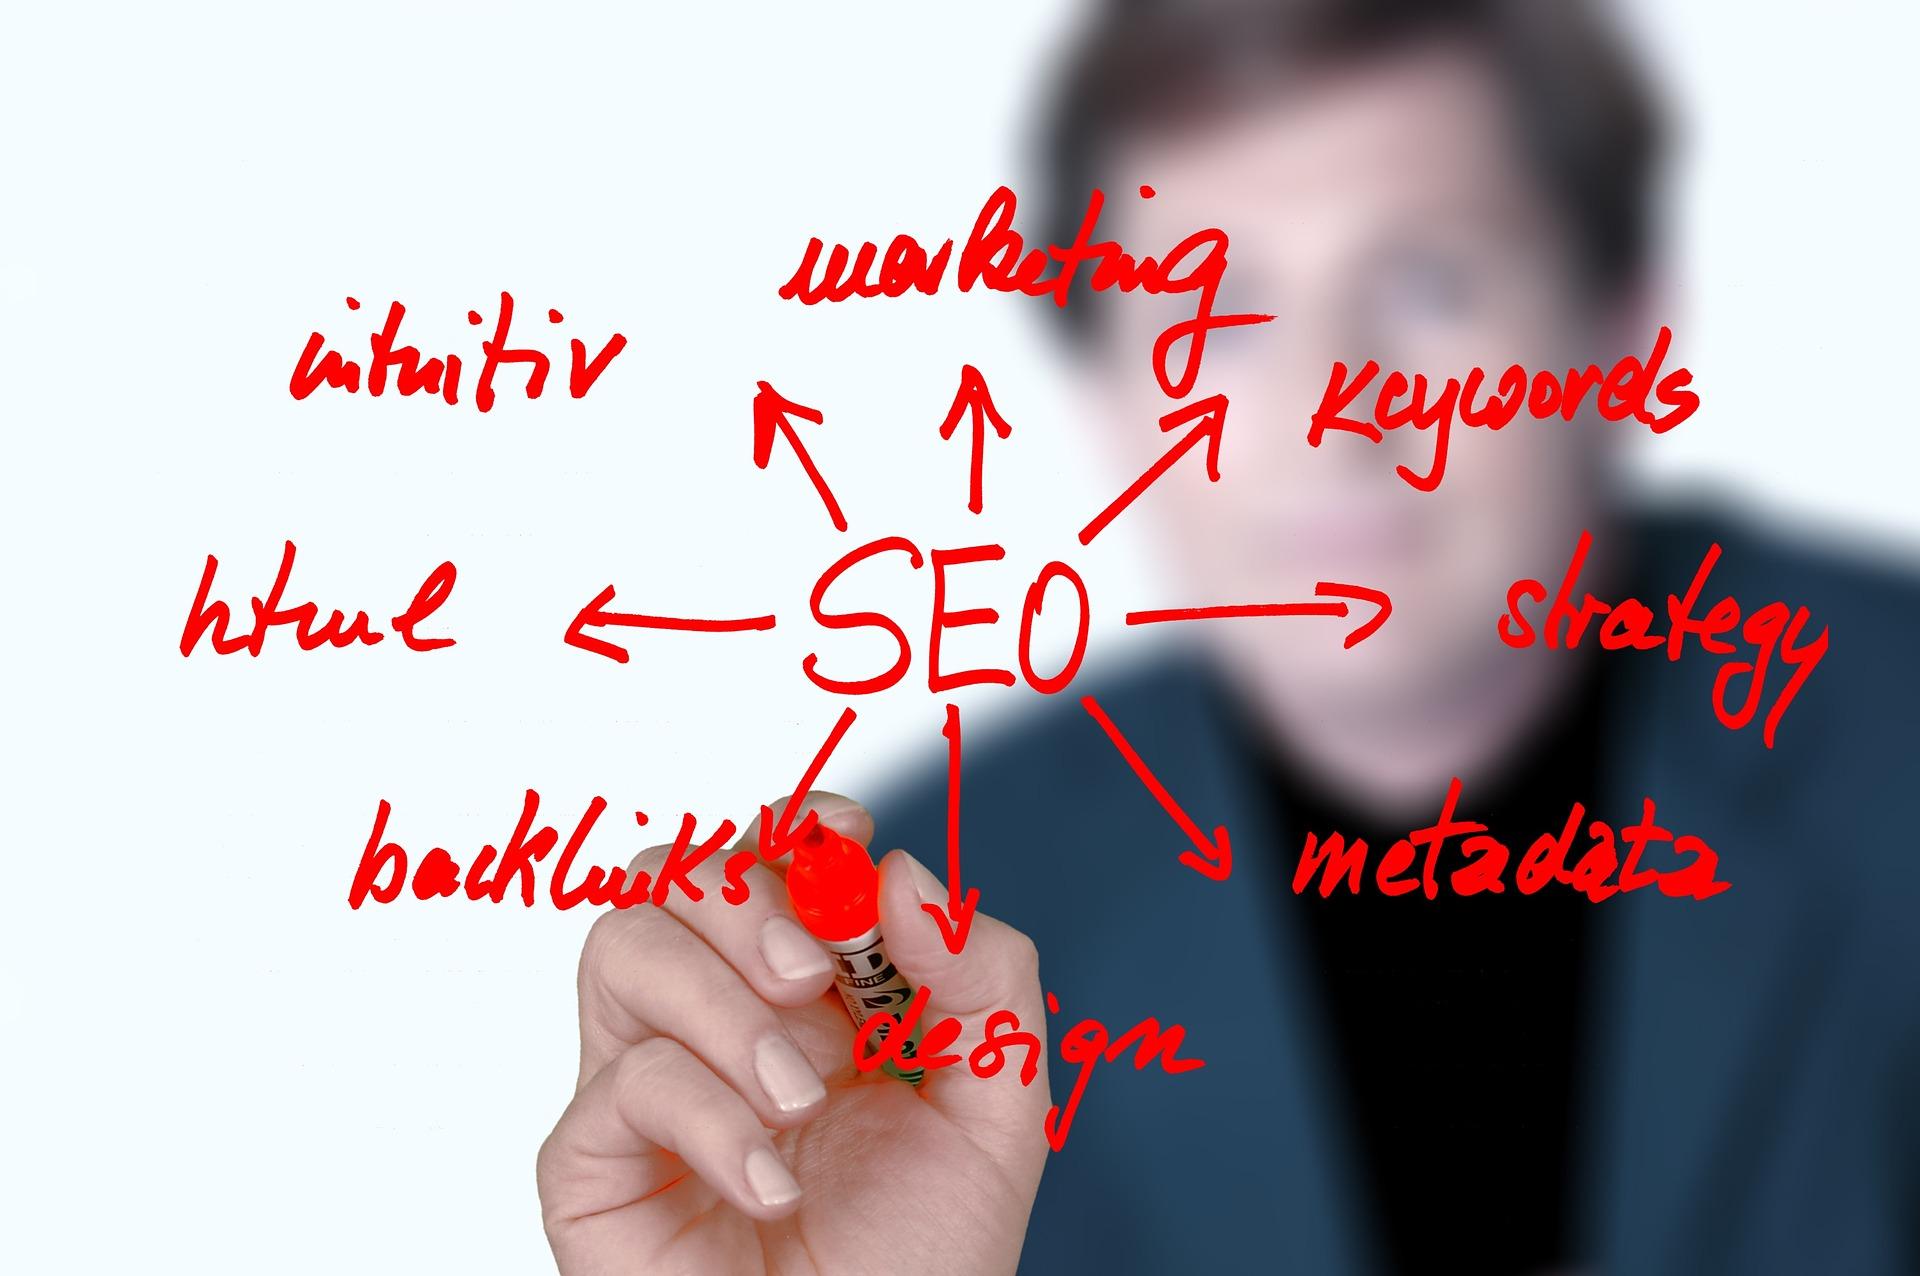 search engine optimization 1359429 1920 - 入れておくと便利!初心者におすすめのWordPressプラグイン11選